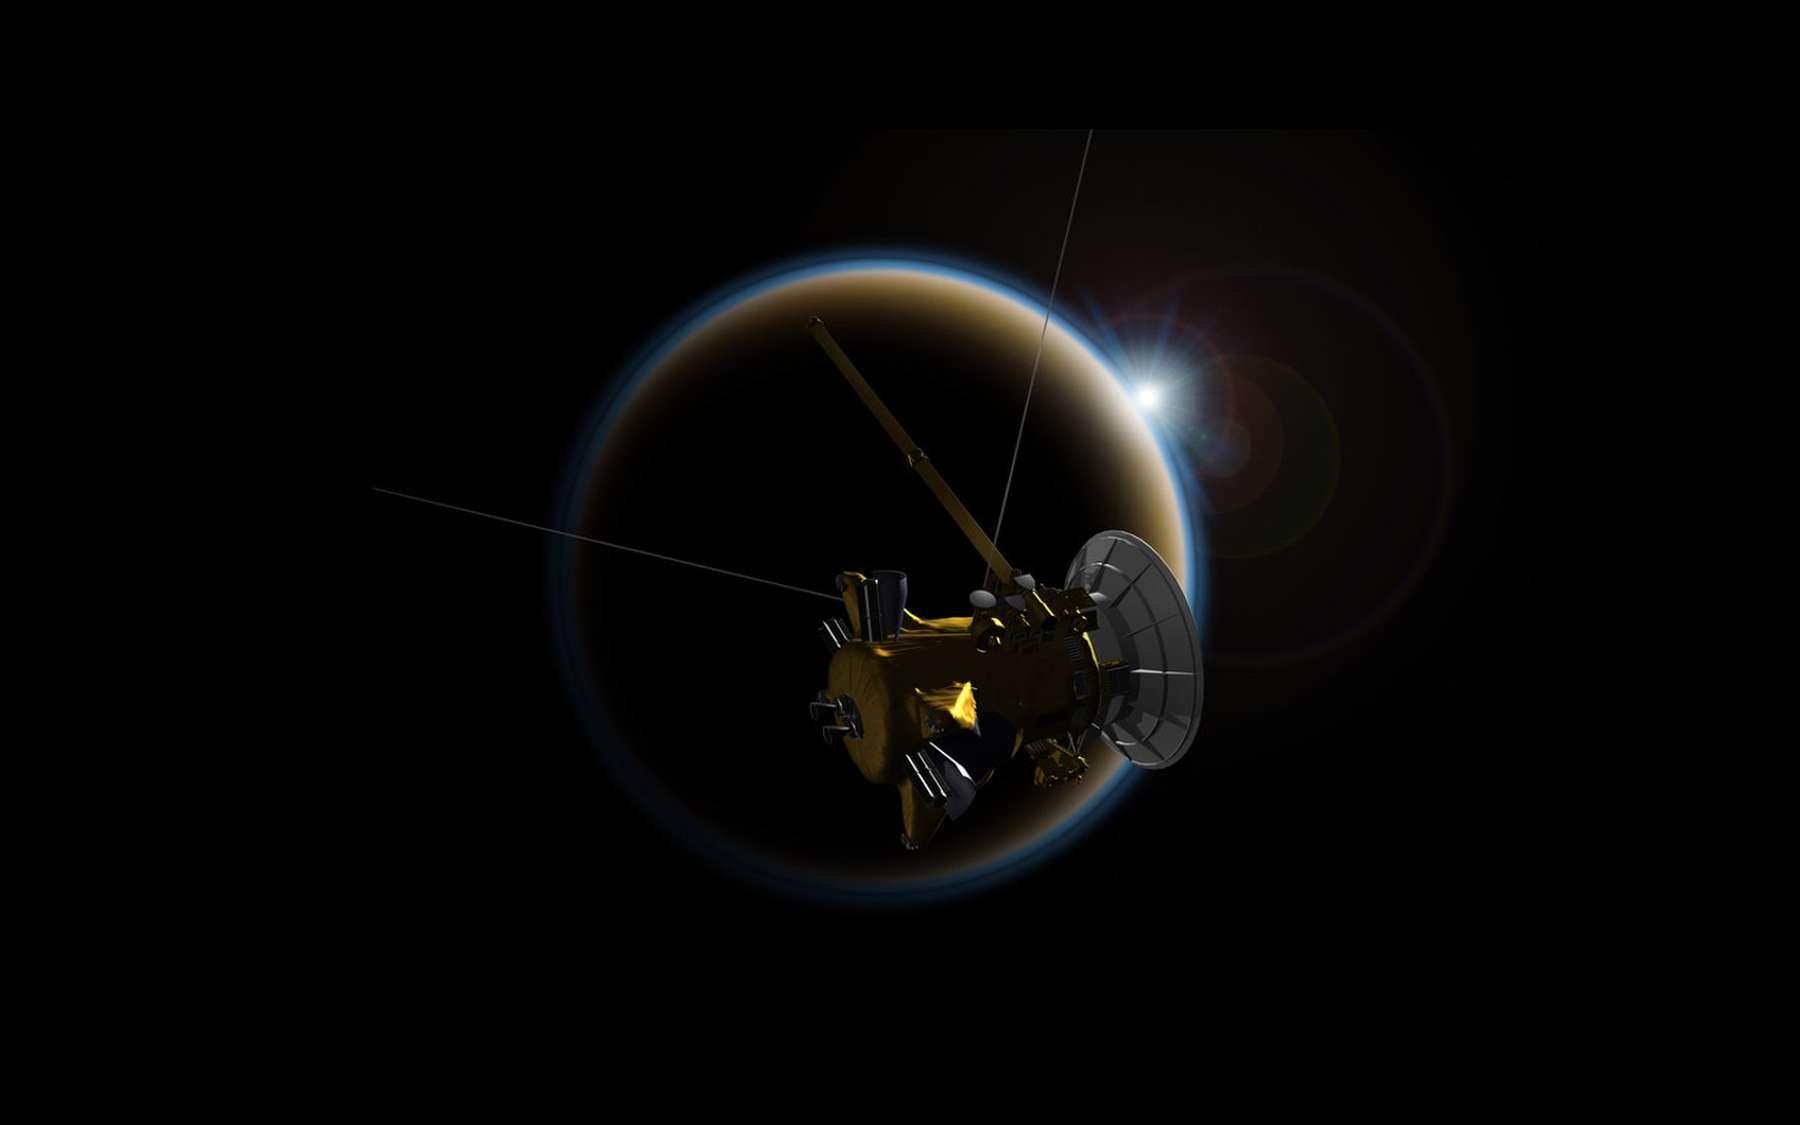 Illustration de la sonde Cassini devant Titan, la plus grande lune de Saturne. © Nasa, JPL-Caltech